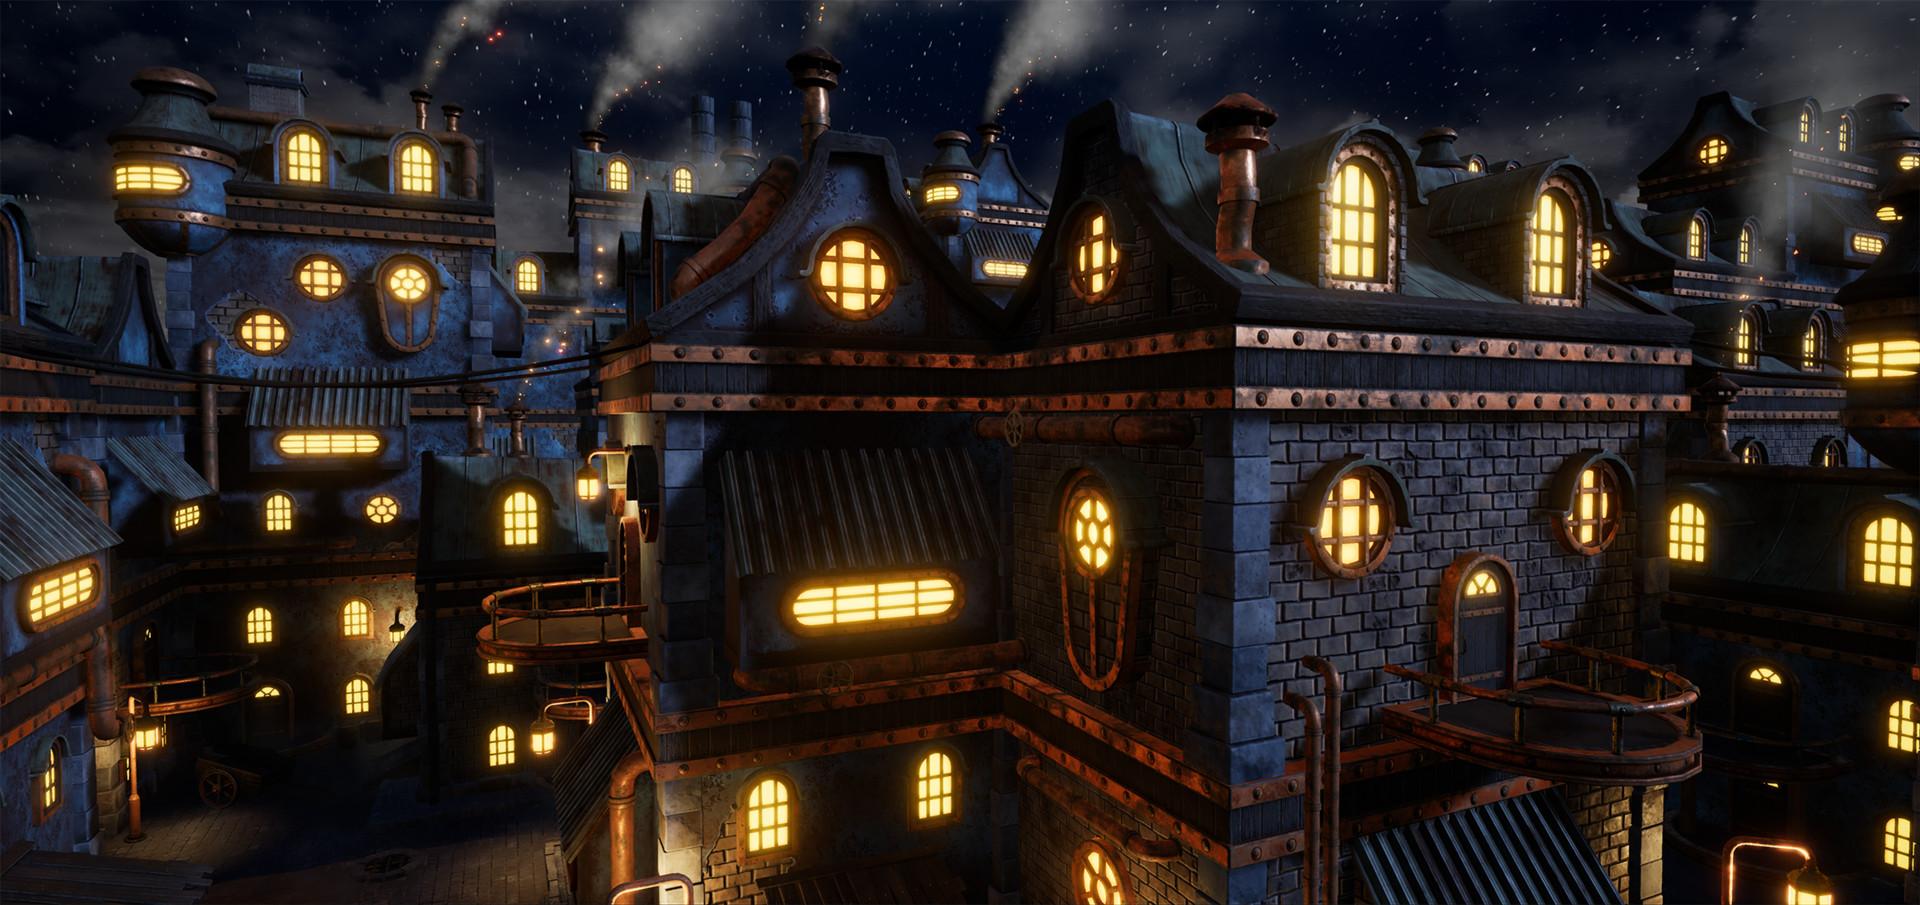 Daniel lindberg steampunkcity night1